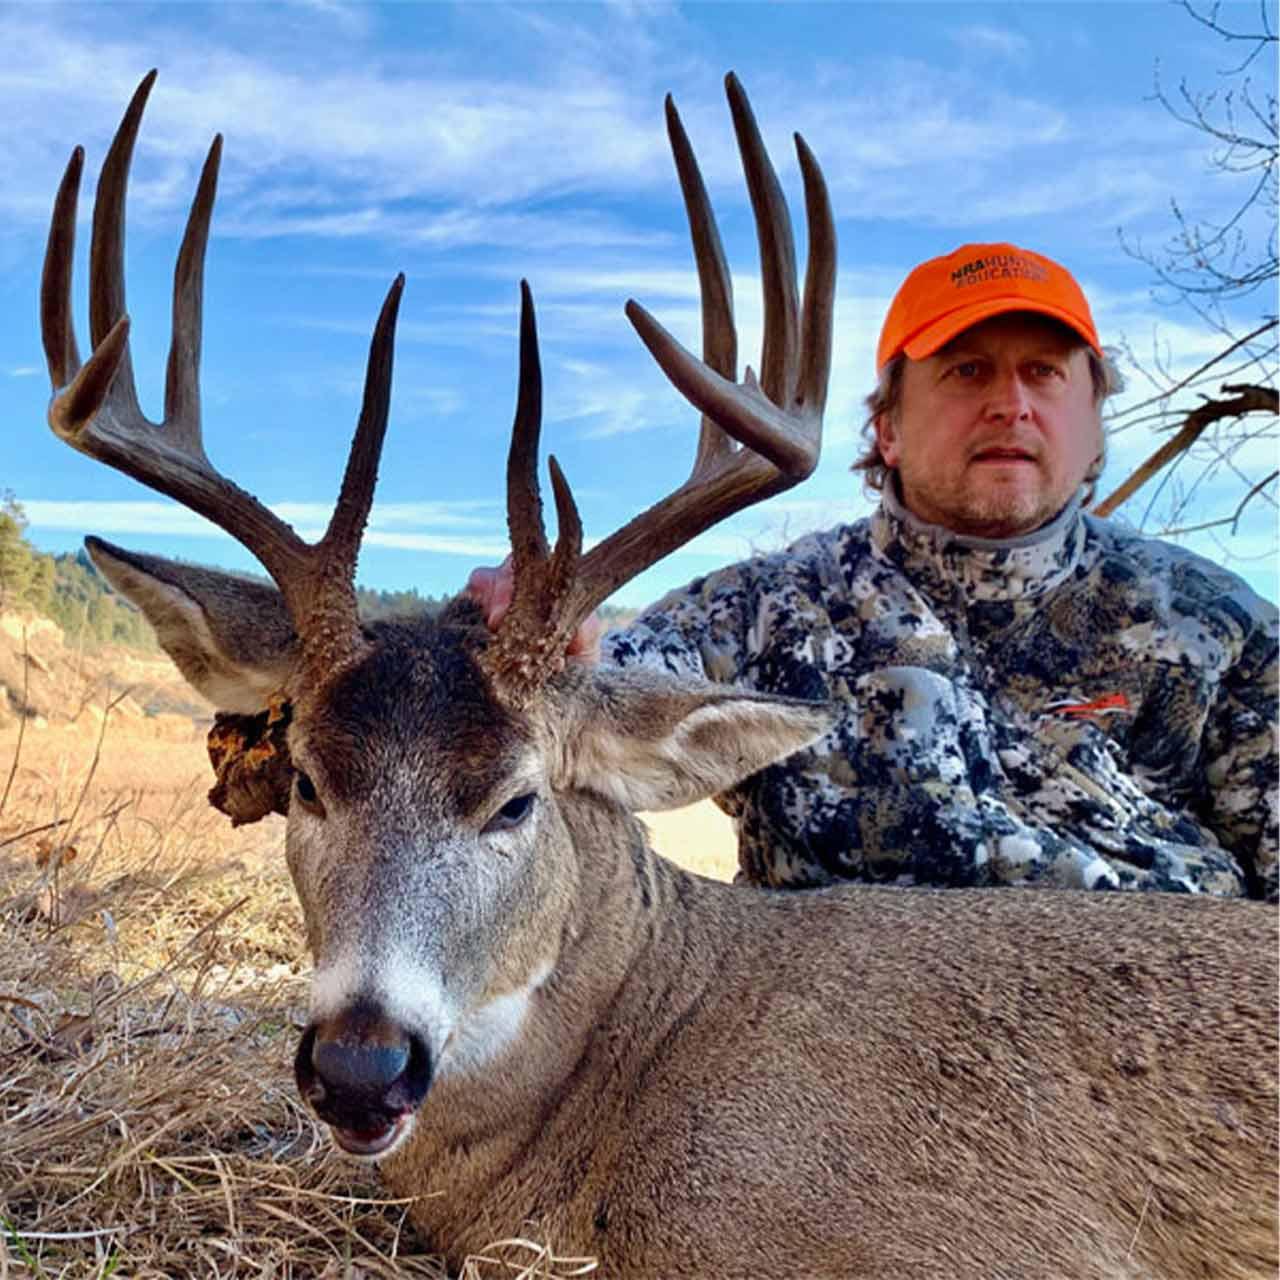 Whitetail deer hunt.